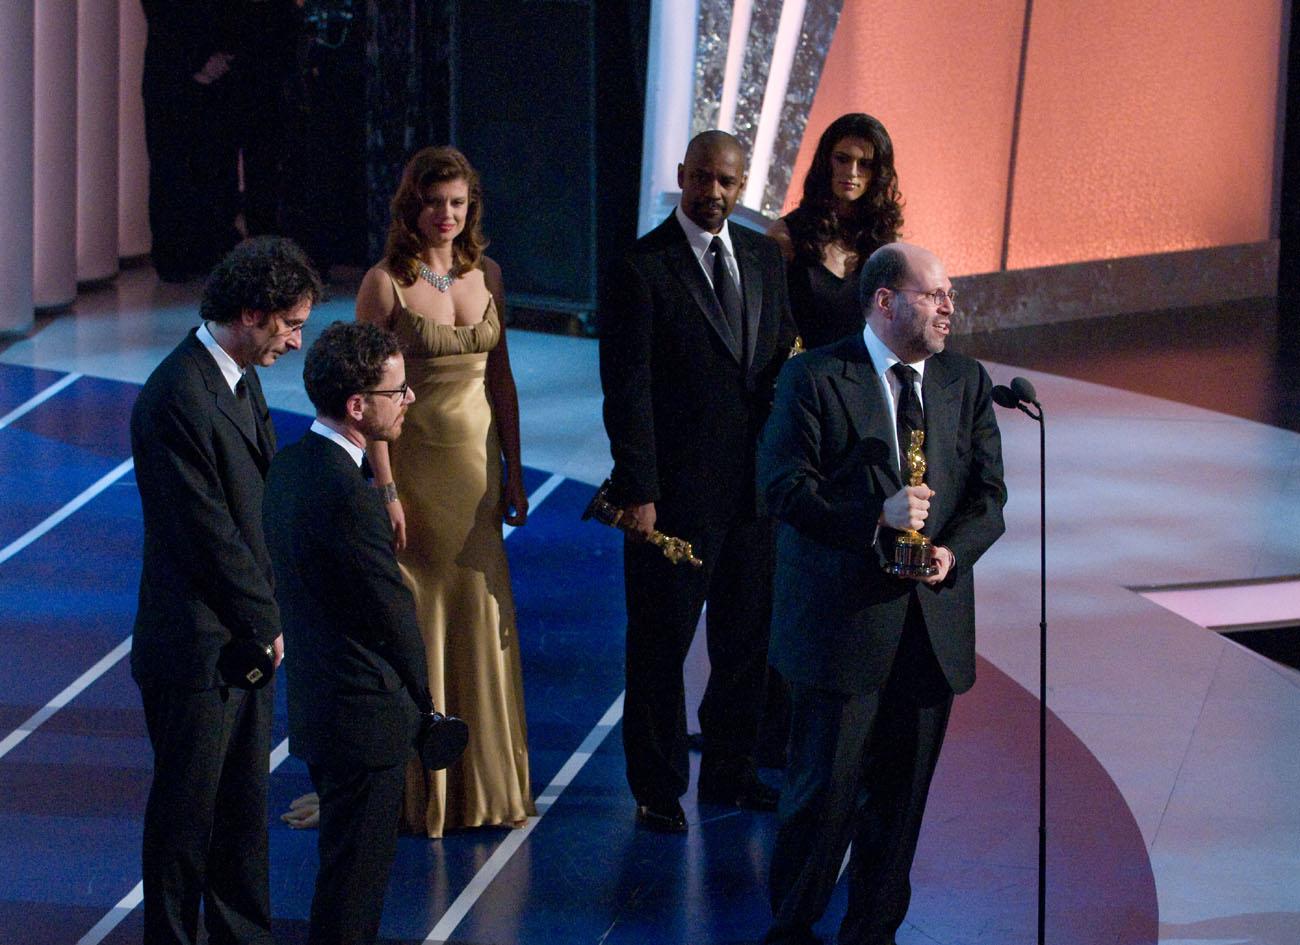 Joel Coen, Ethan Coen, Denzel Washington, Scott Rudin - Oscar 2008